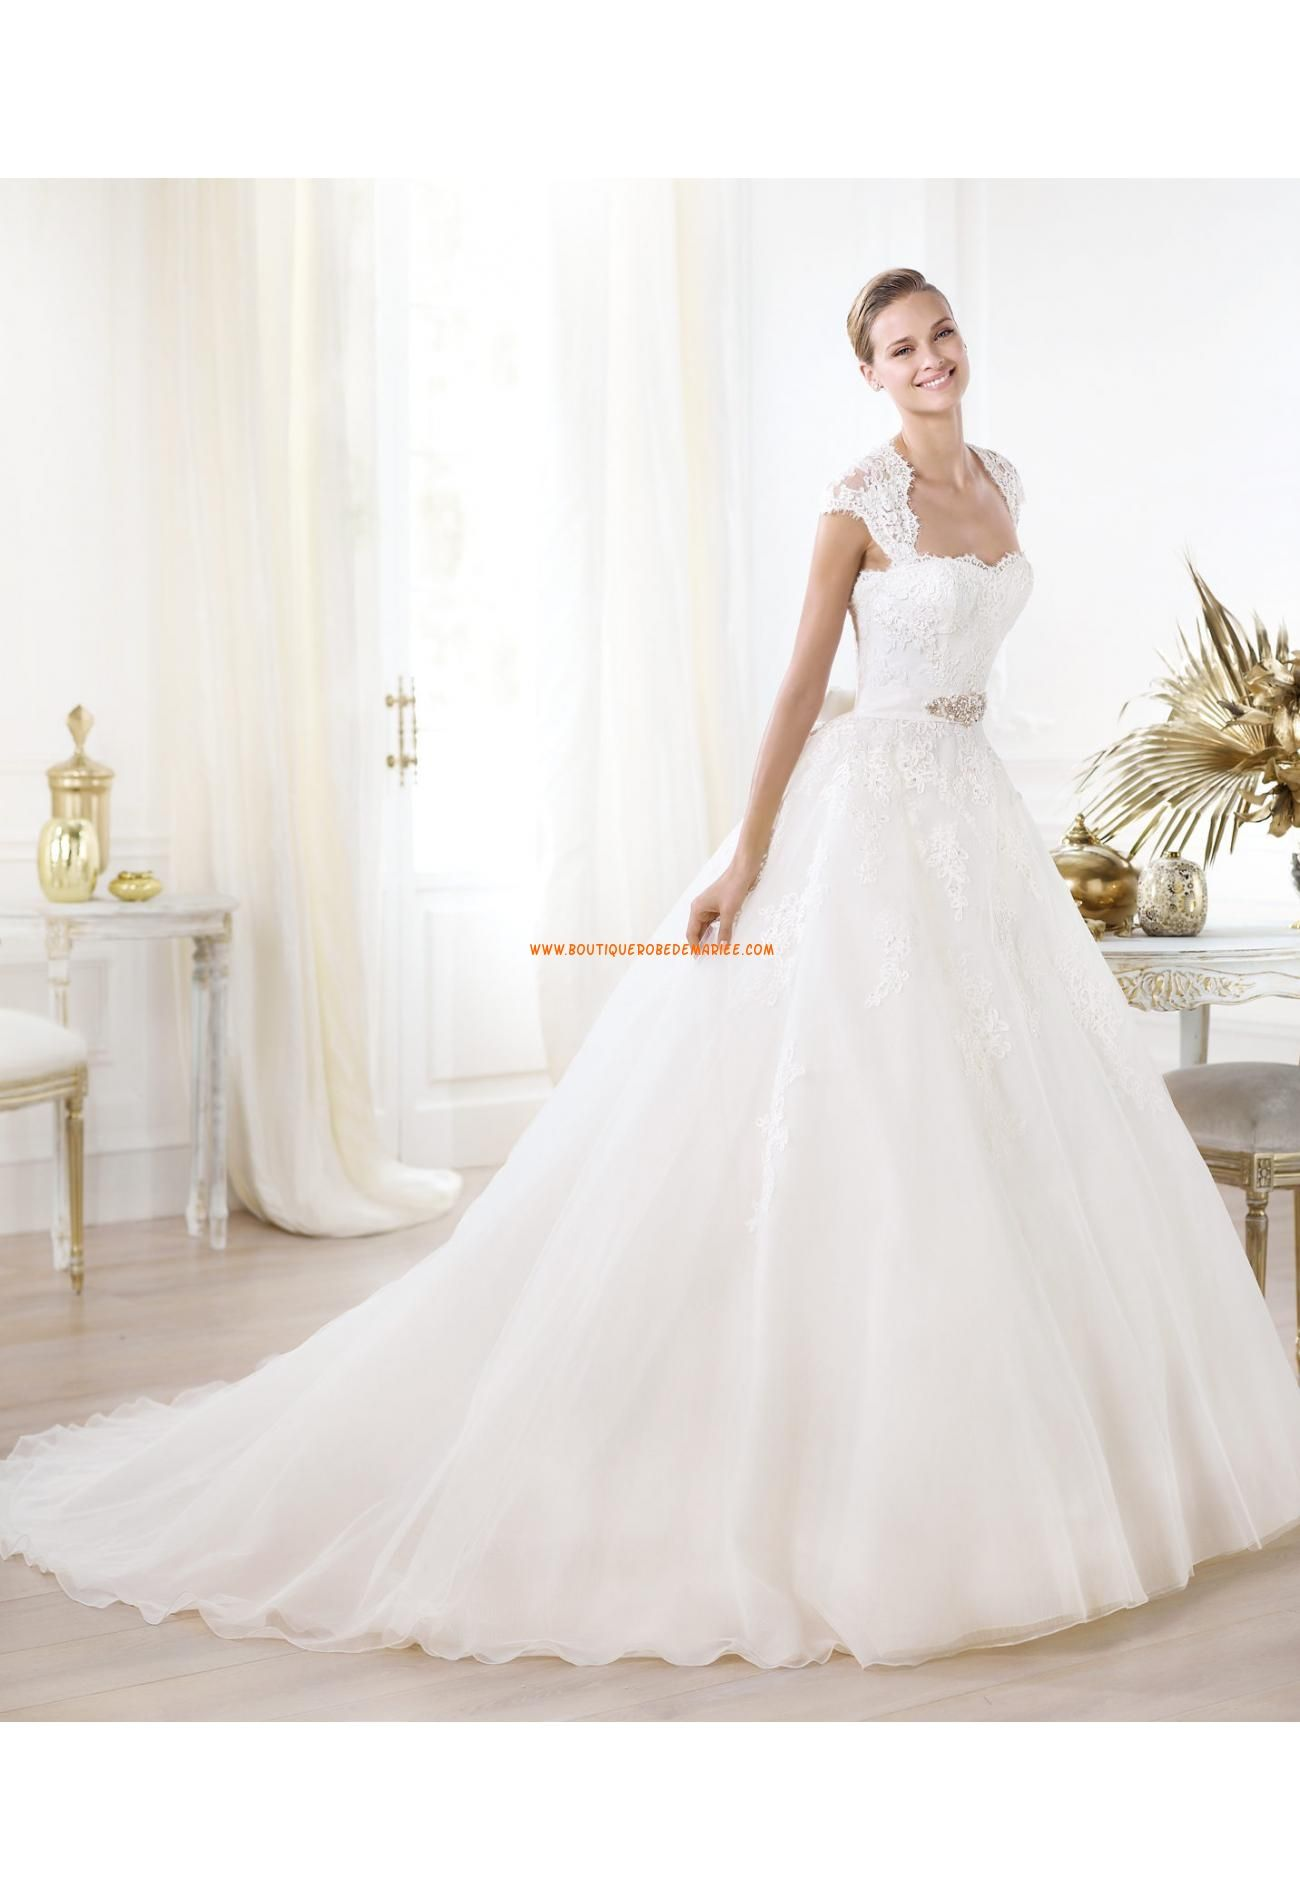 robe de mari e princesse organza dentelle avec bretelles amovibles mariage pinterest robe. Black Bedroom Furniture Sets. Home Design Ideas